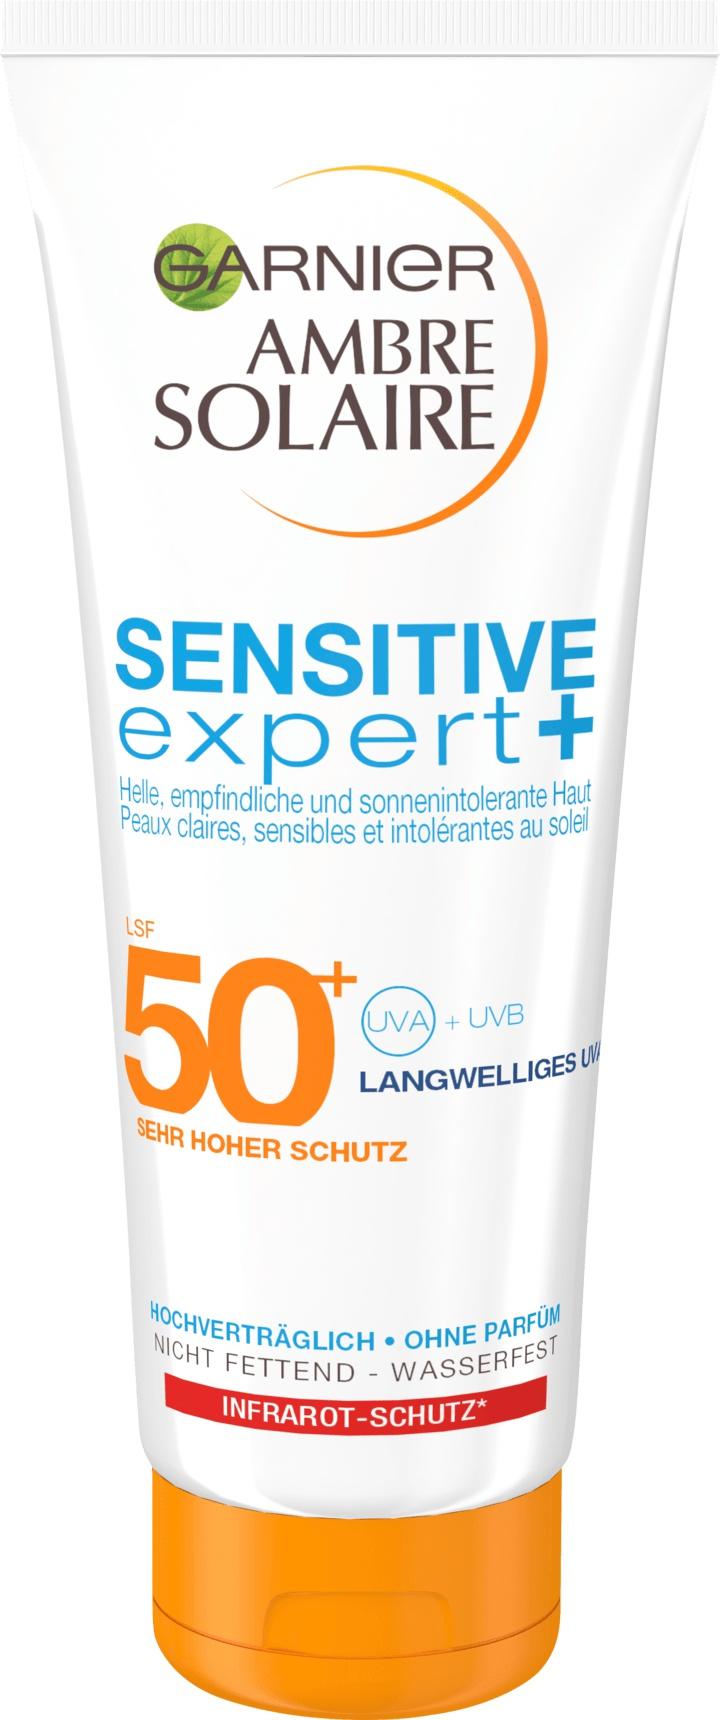 Garnier Ambre Solaire Sensitive Expert SPF 50+